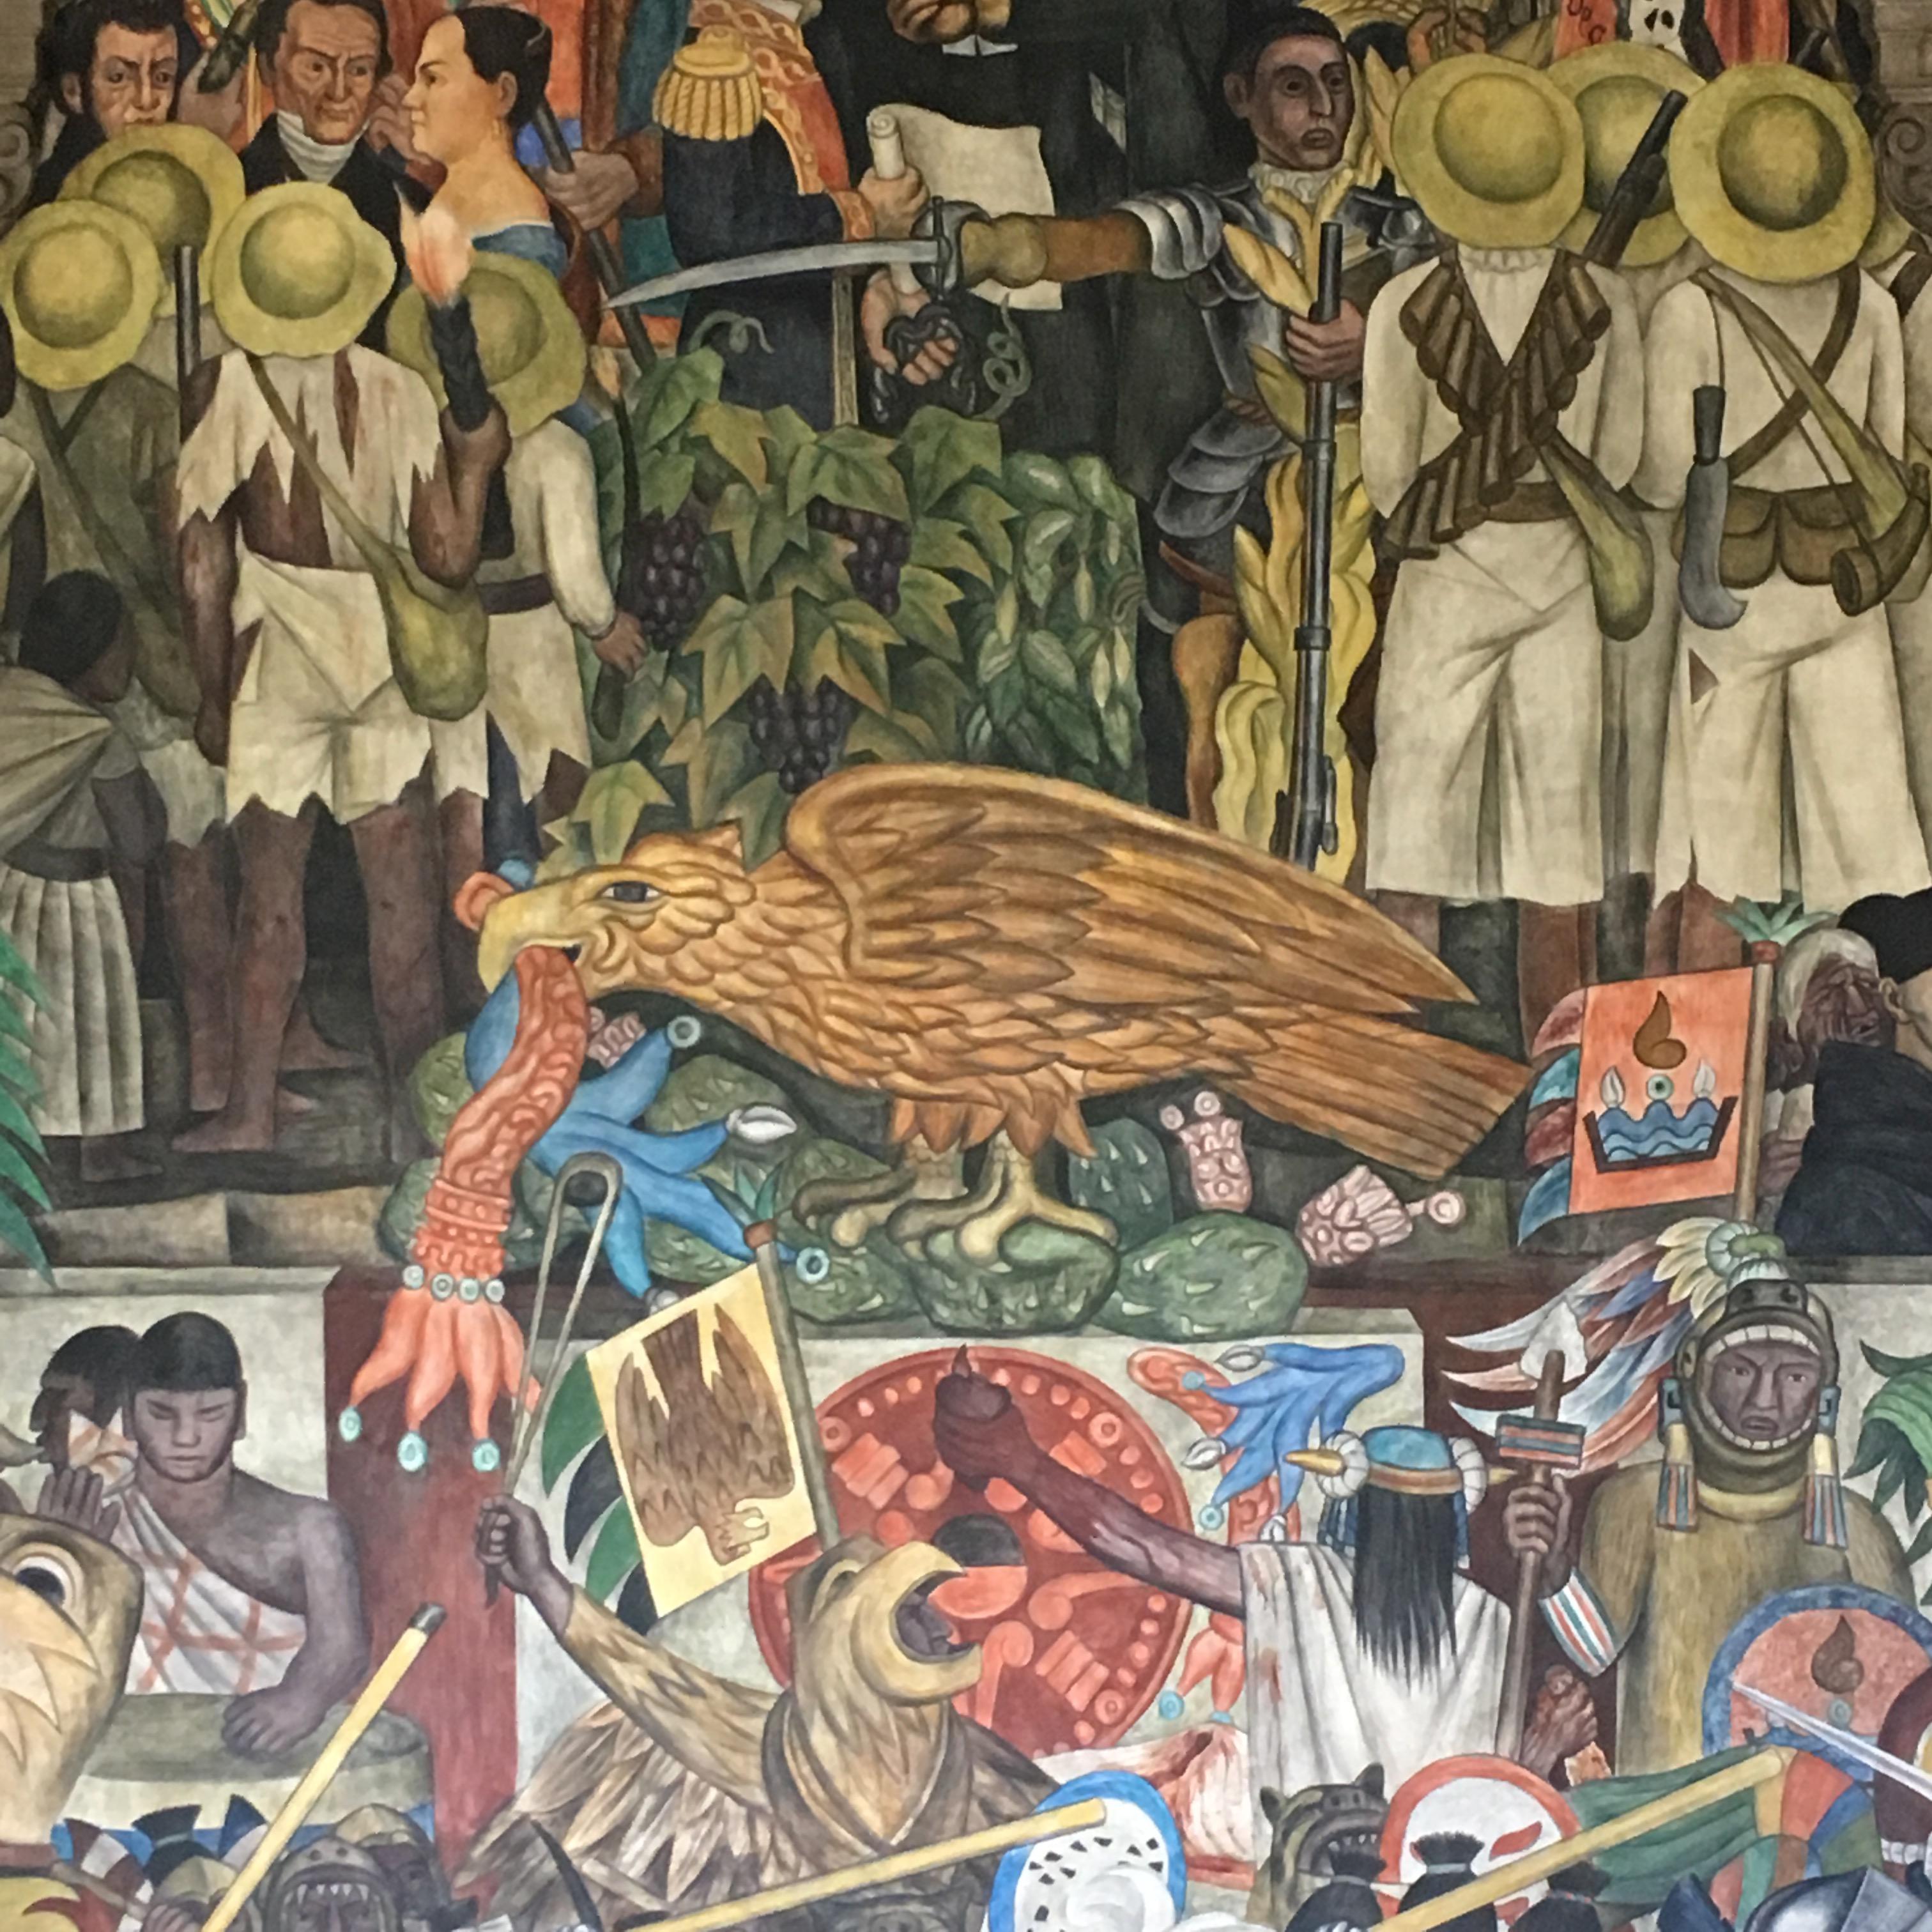 Detalle del mural de Diego Rivera CDMX (Ideas on Tour-Anna Rodriguez Casadevall)